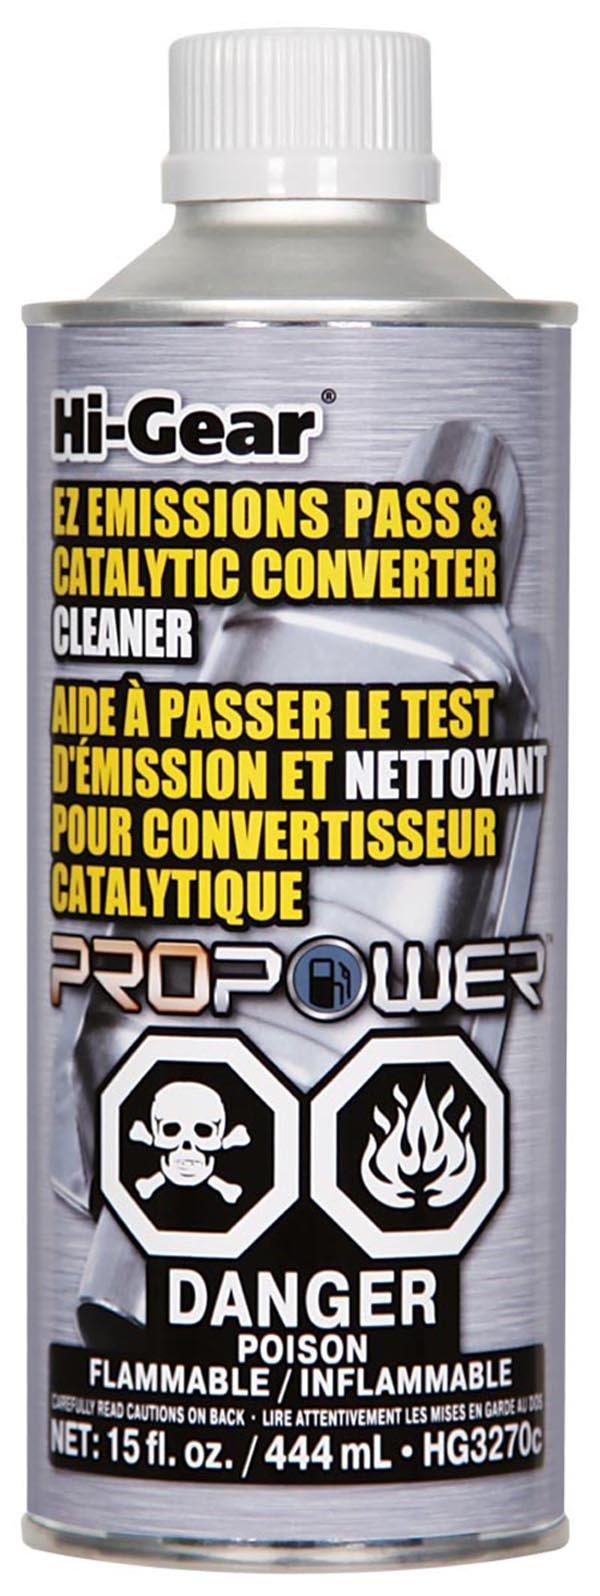 Hi-Gear HG3270c EZ Emissions Pass & Catalytic Converter Cleaner, 15 fl. oz.